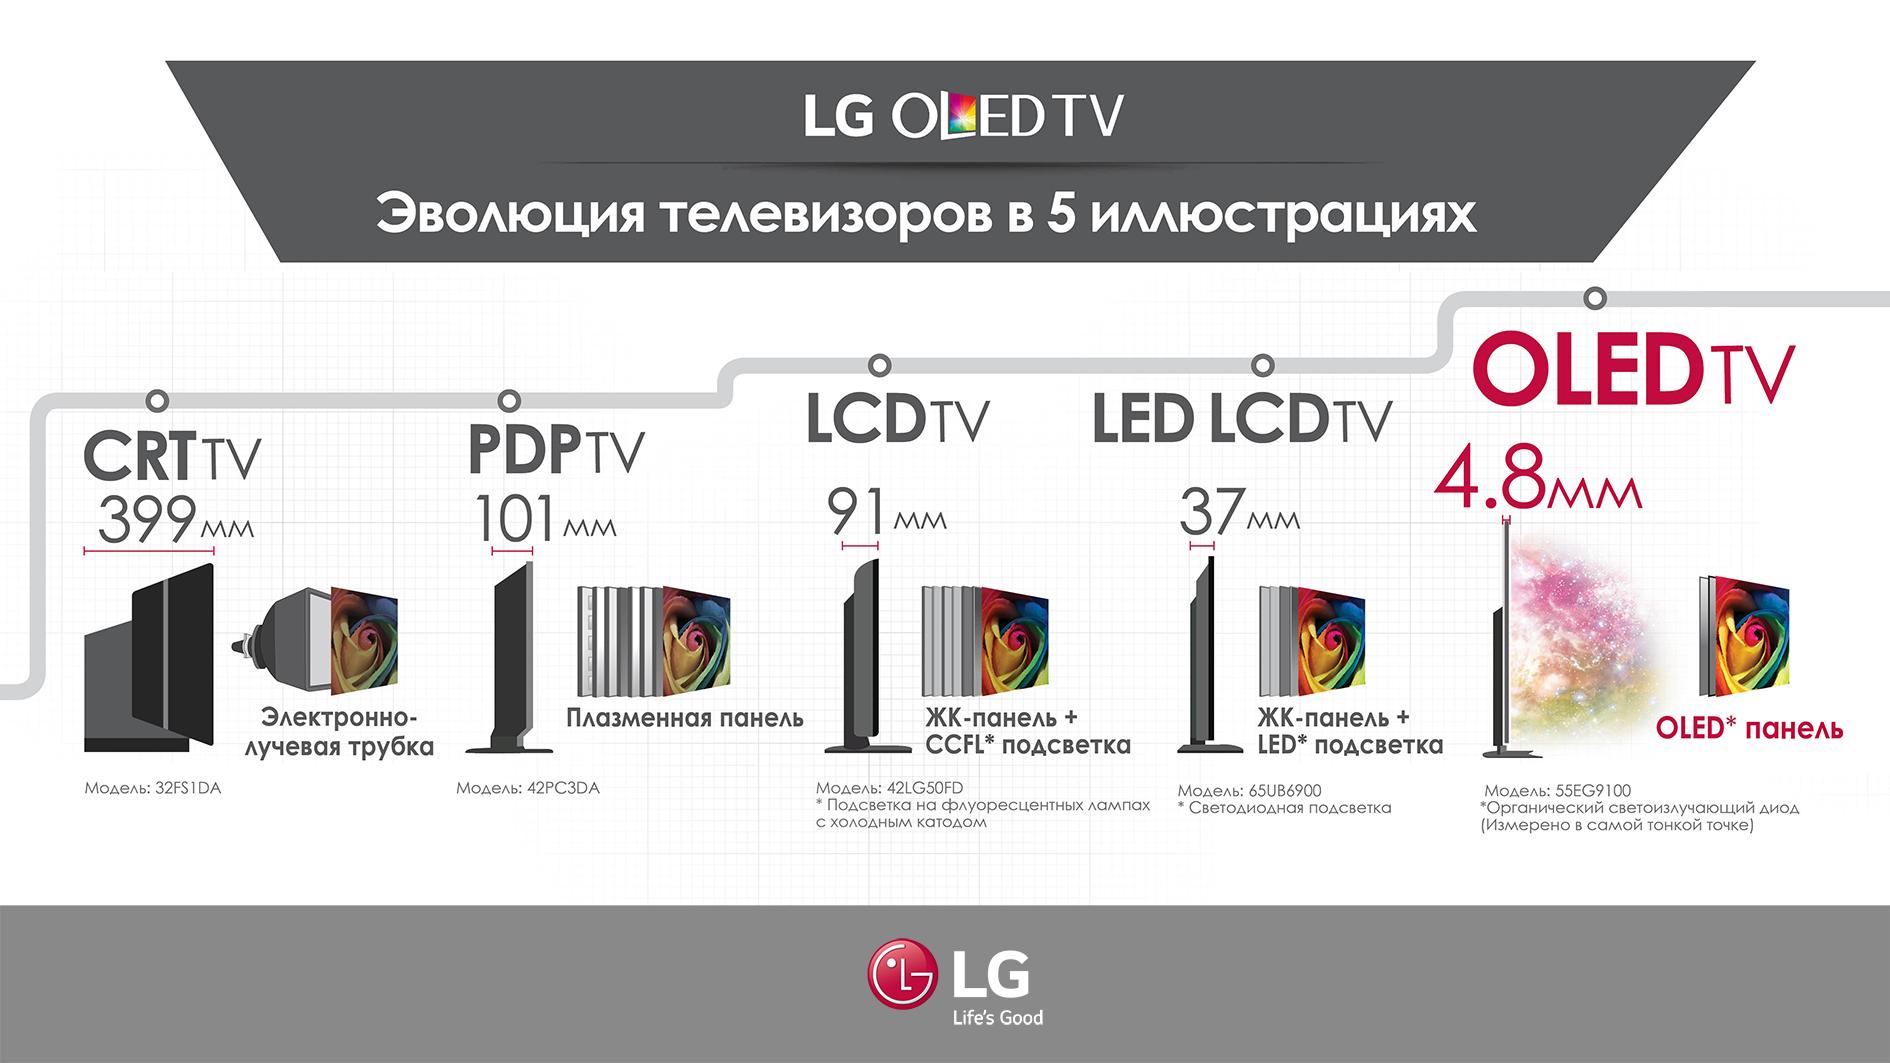 LG TVs evolution